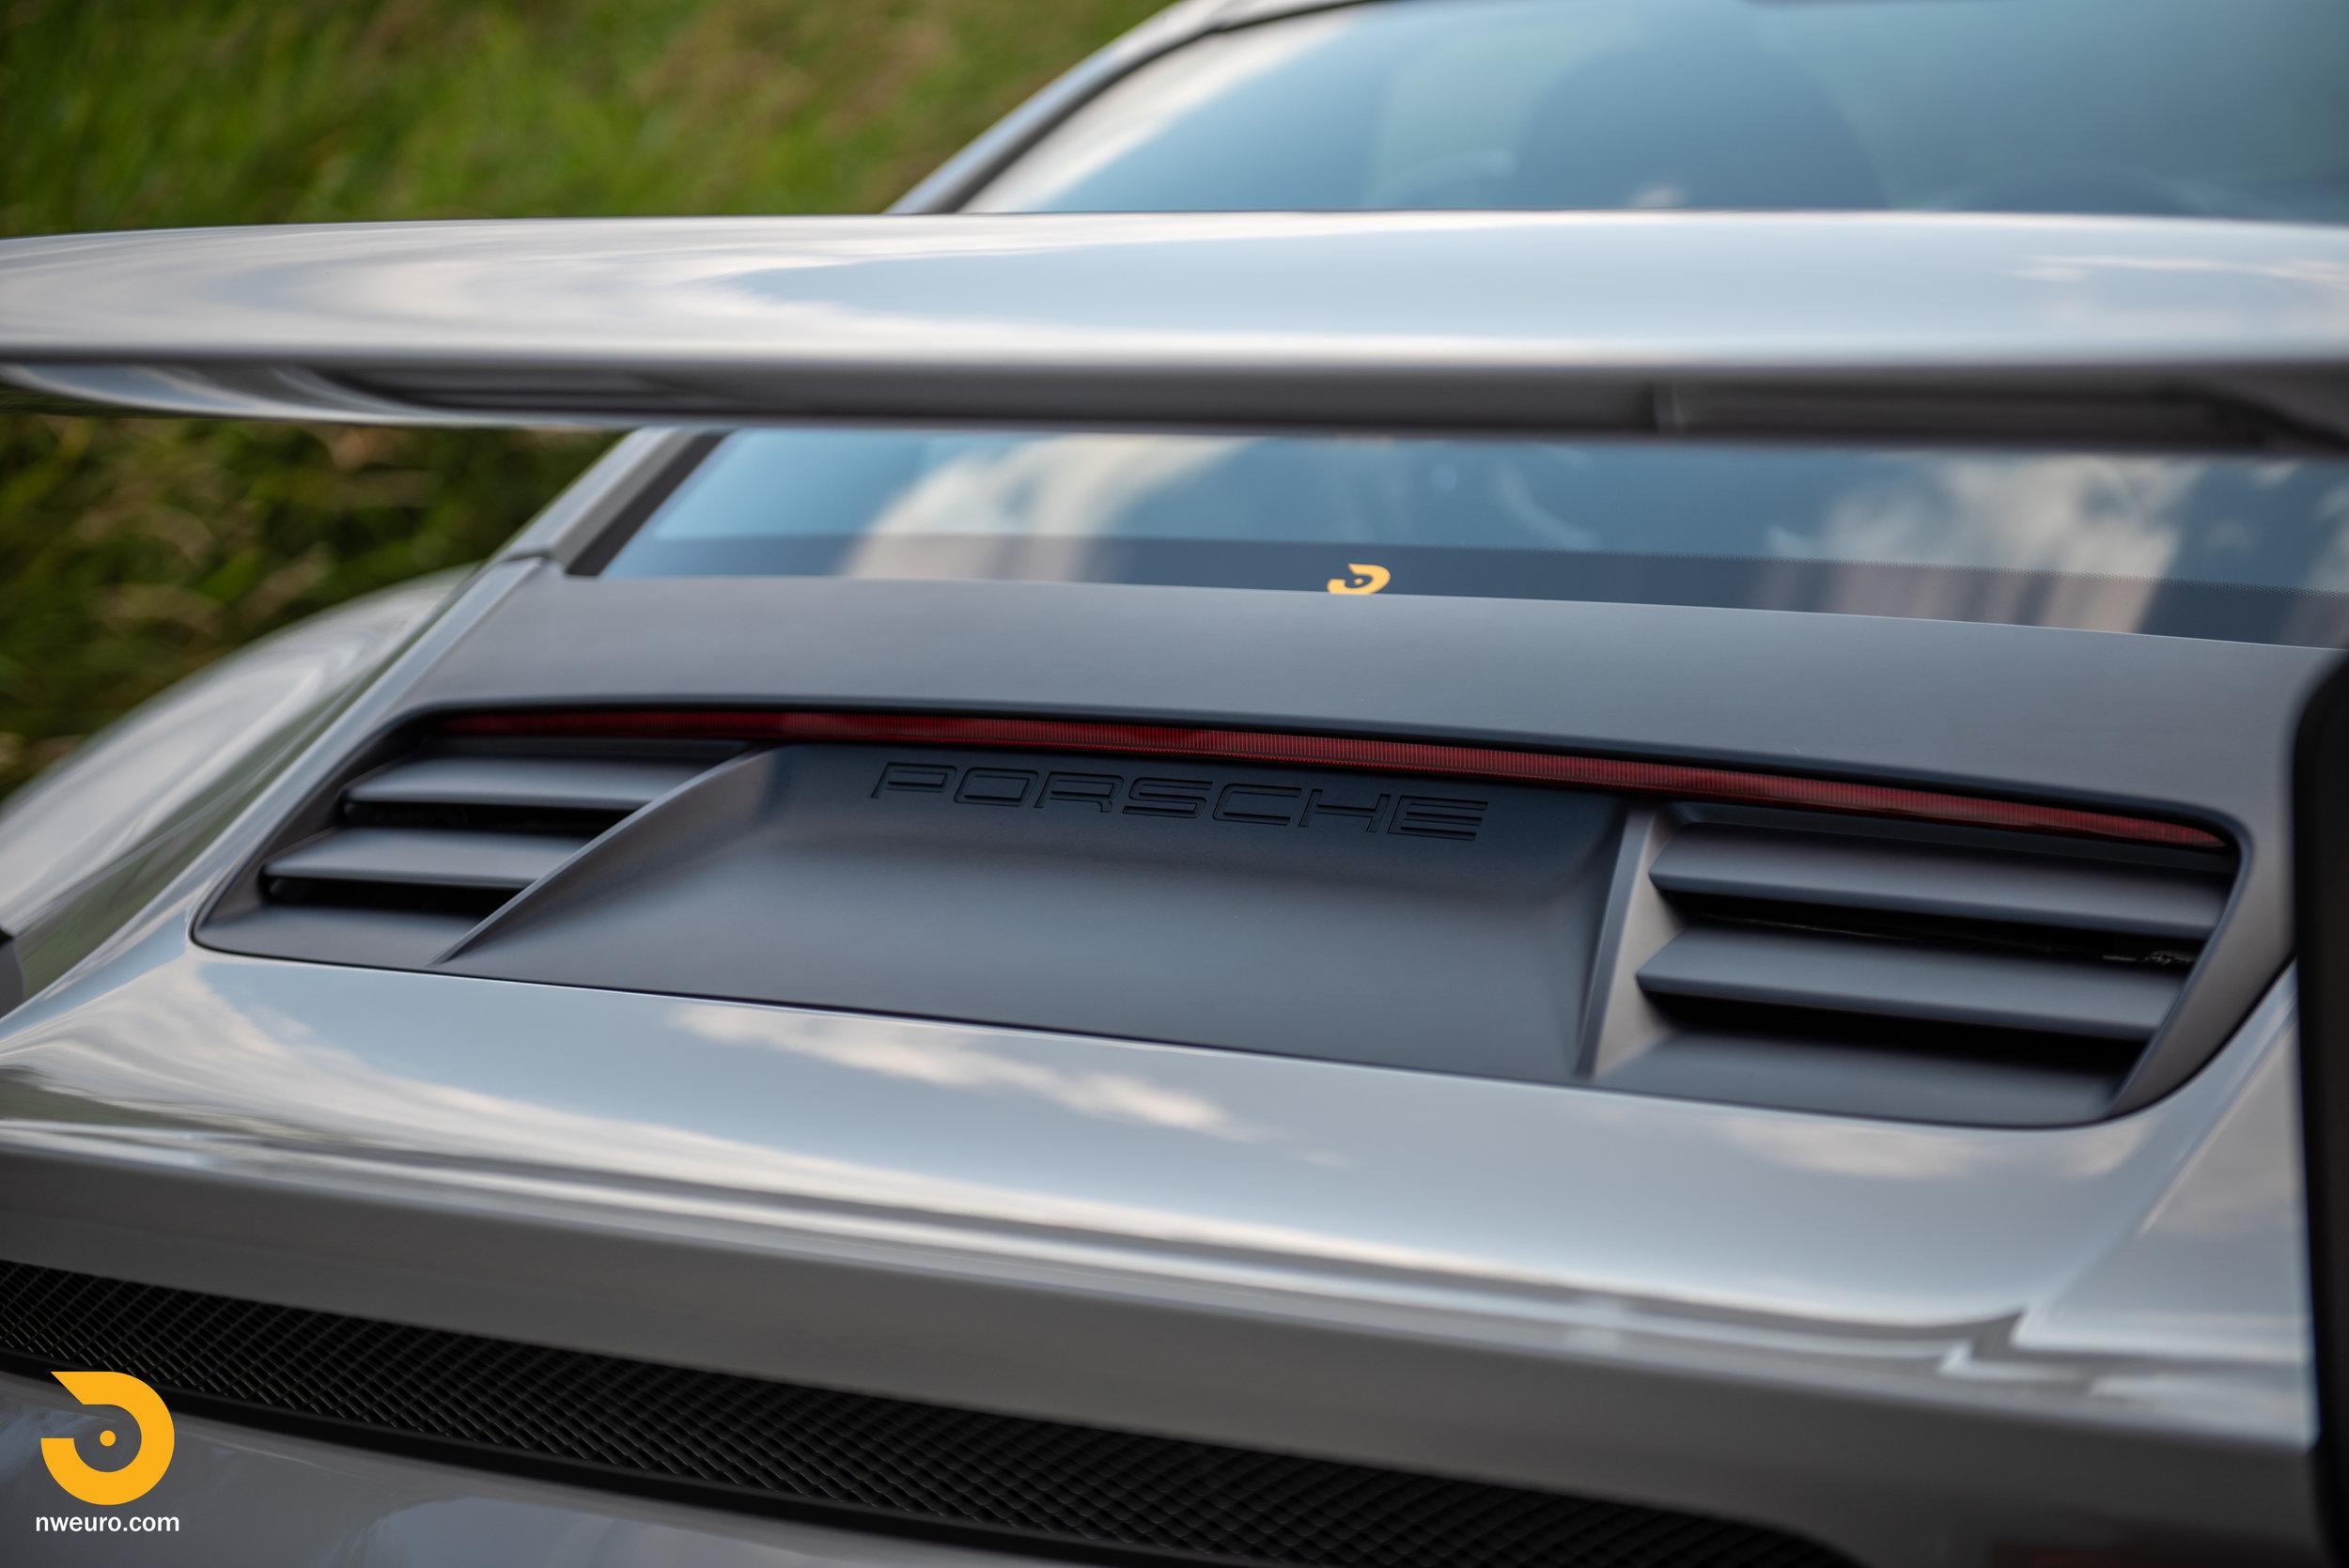 2019 Porsche GT3 RS - Chalk-71.jpg